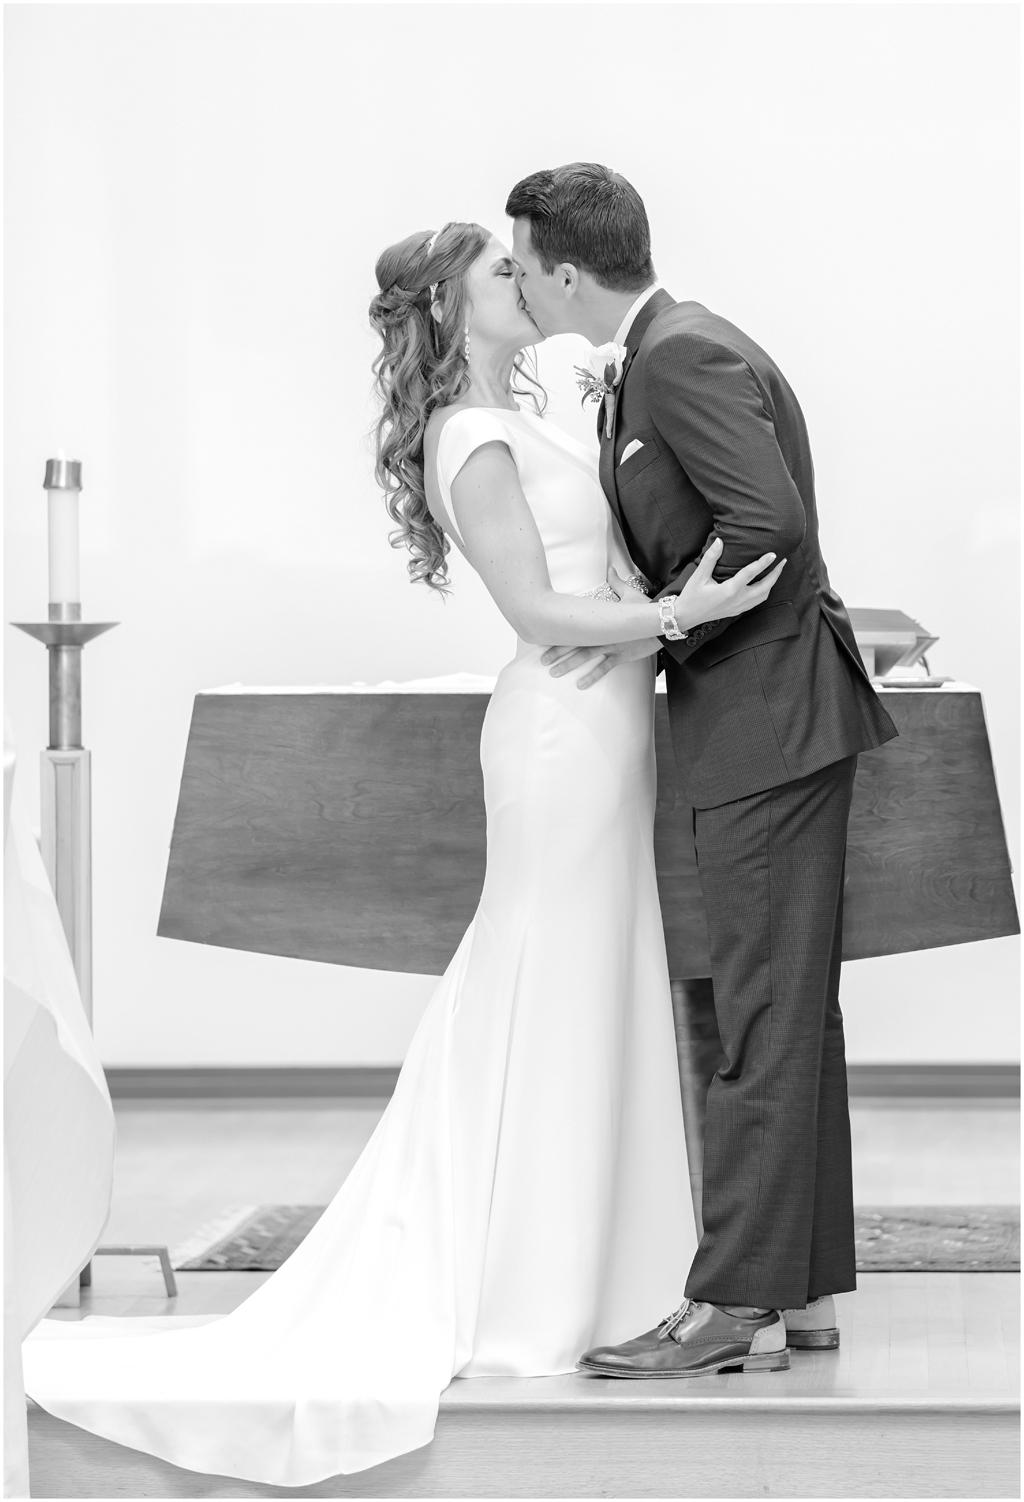 ritz-carlton-georgetown-wedding-washington-dc-photography-liz-stewart-photo-00021